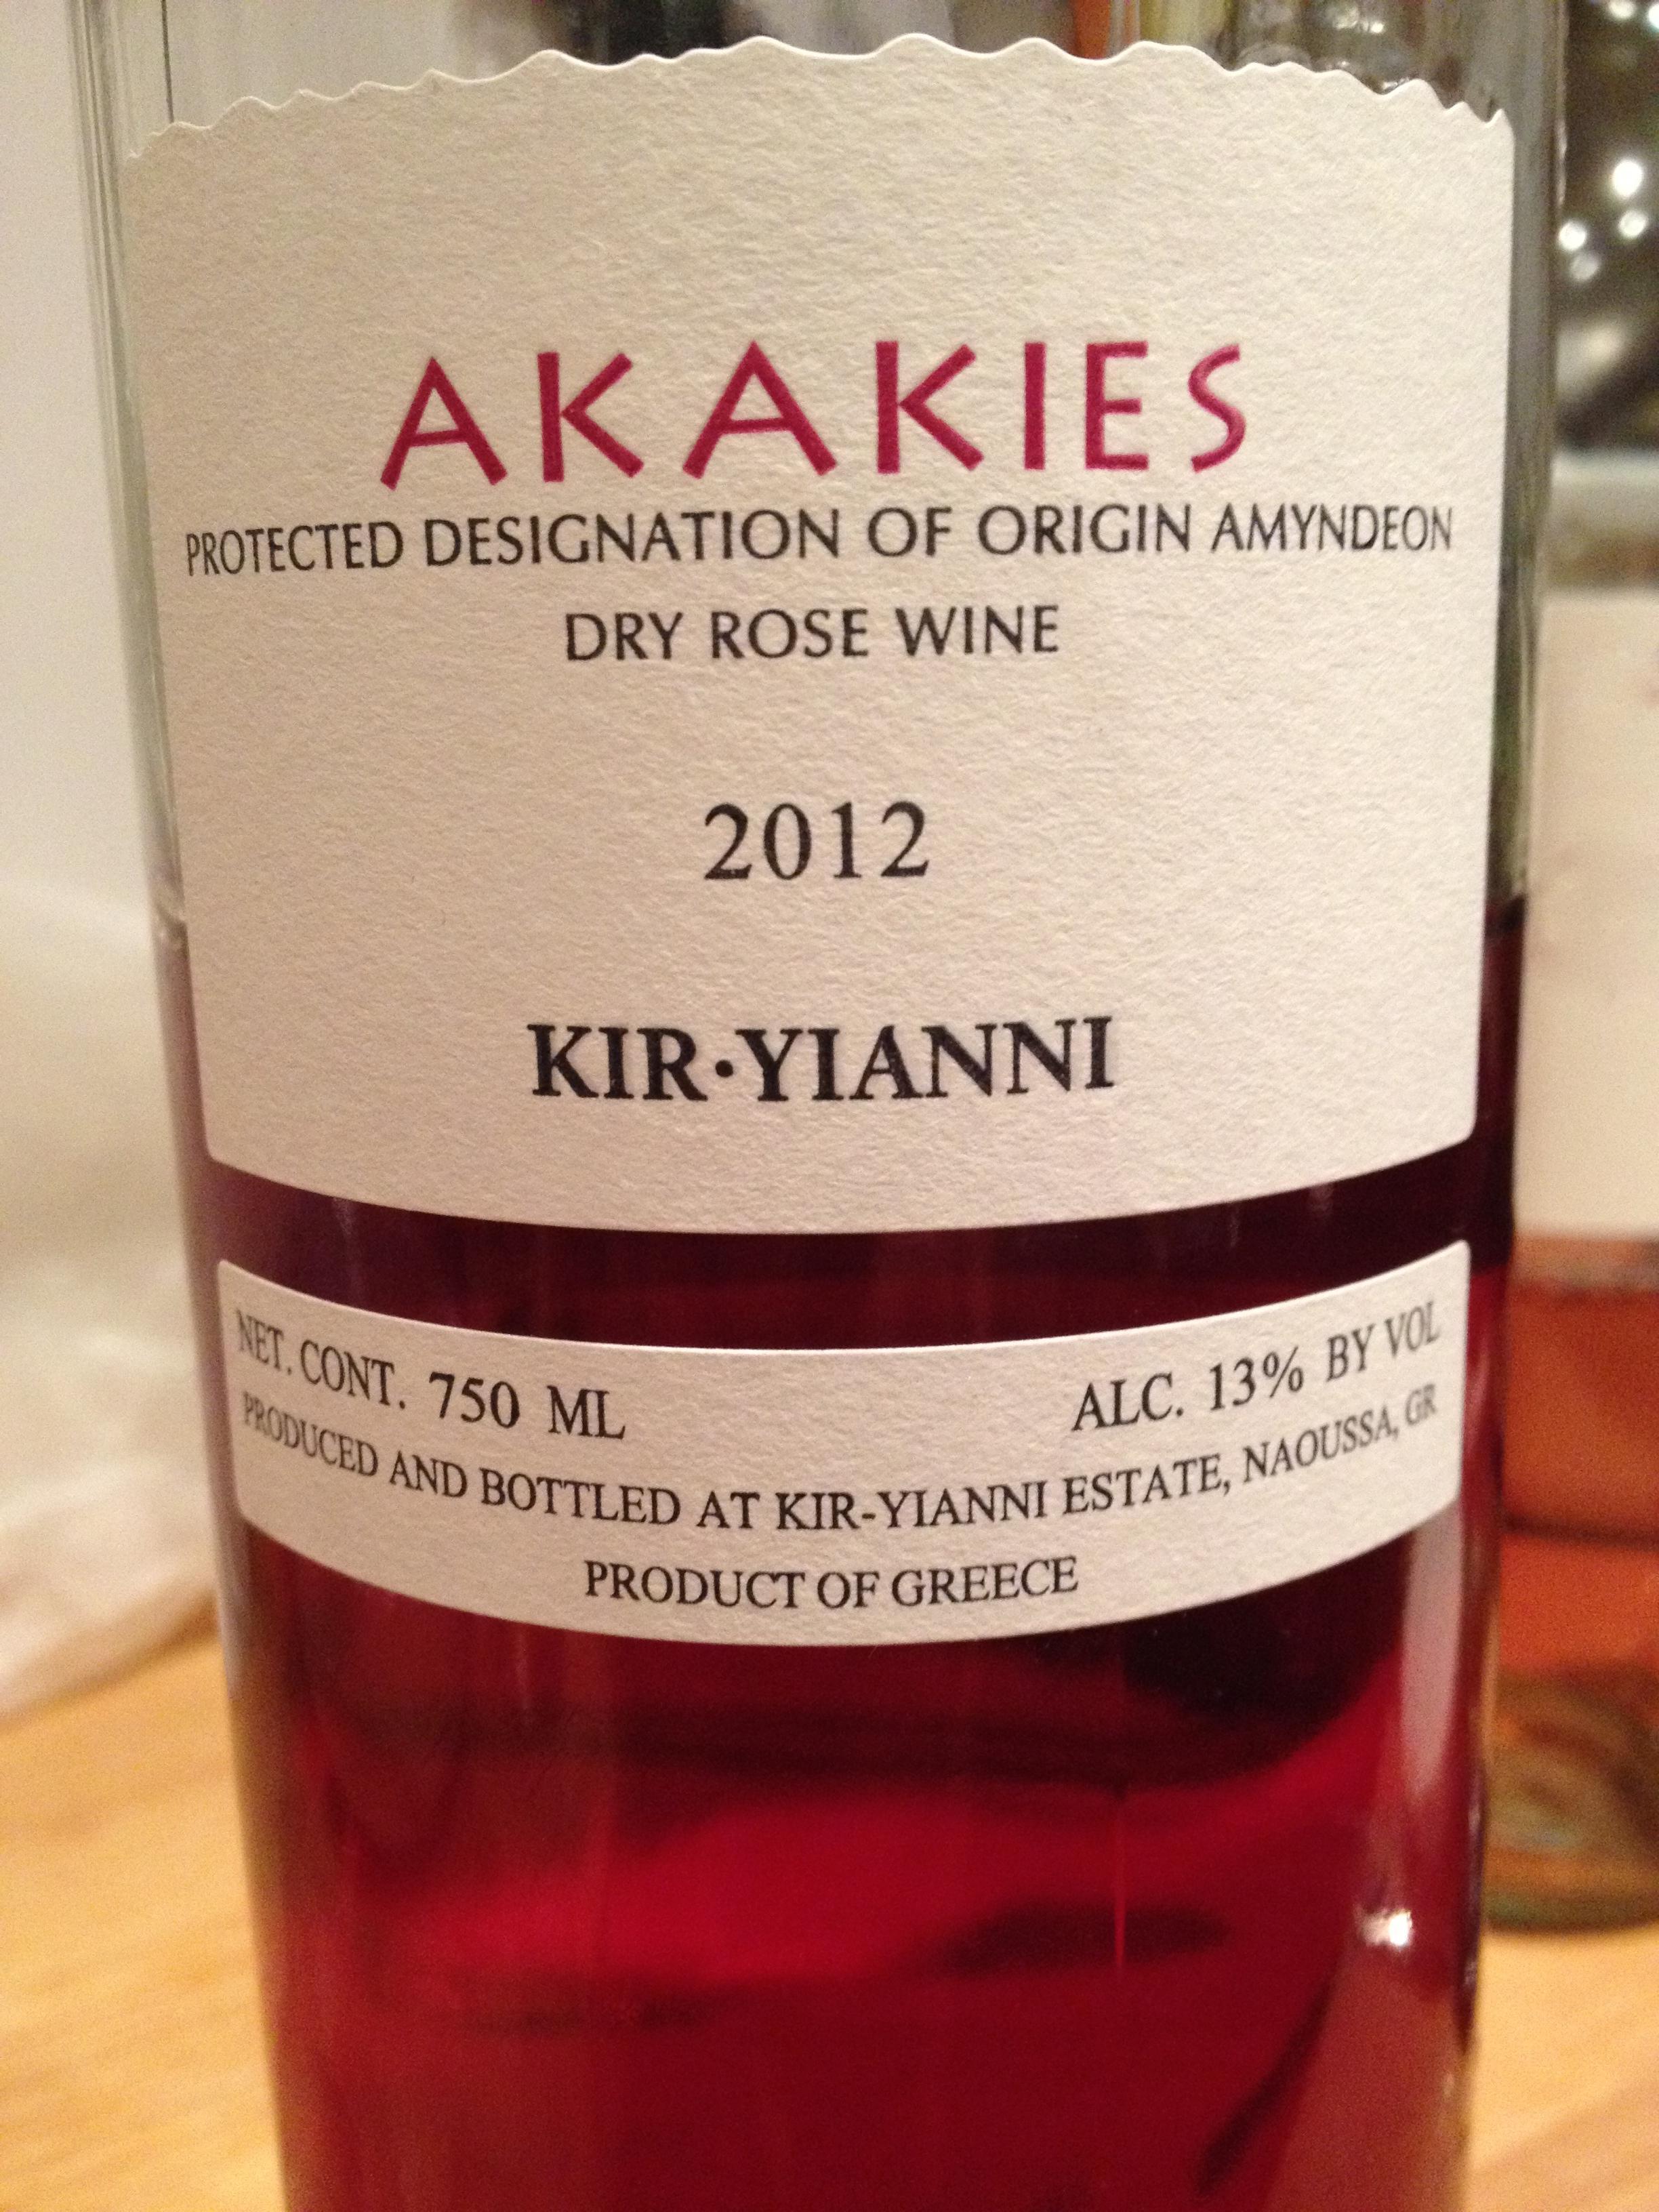 2012 Kir-Yianni Akakies, Rosé, Amyndeon, Greece